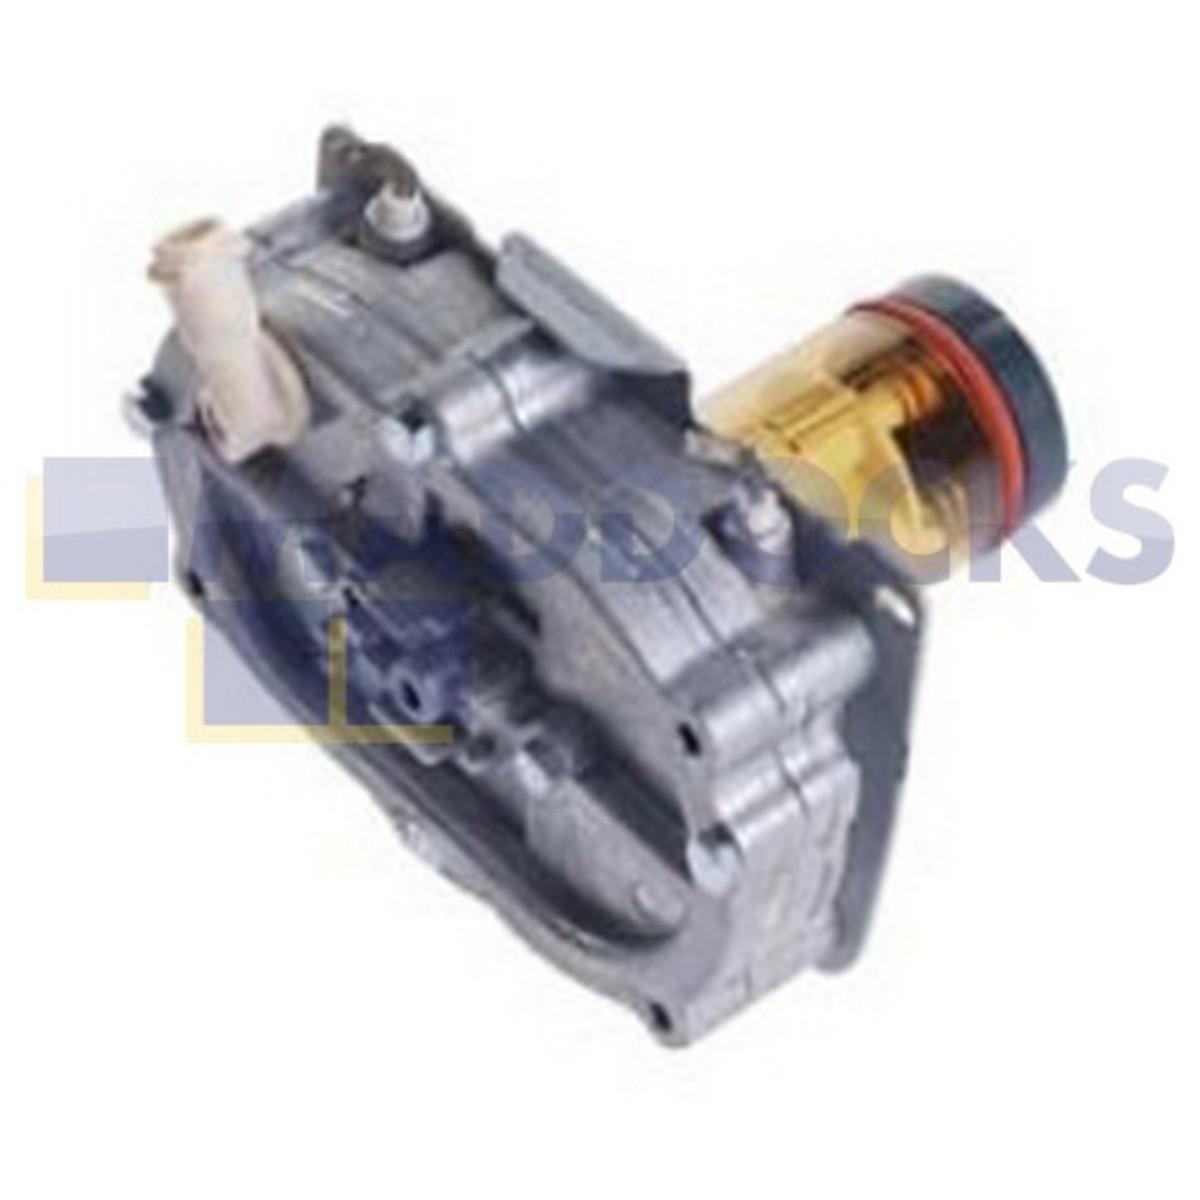 Delonghi Coffee Maker Heating Element : Genuine Original DeLonghi Coffee Maker Heater Element (230V)